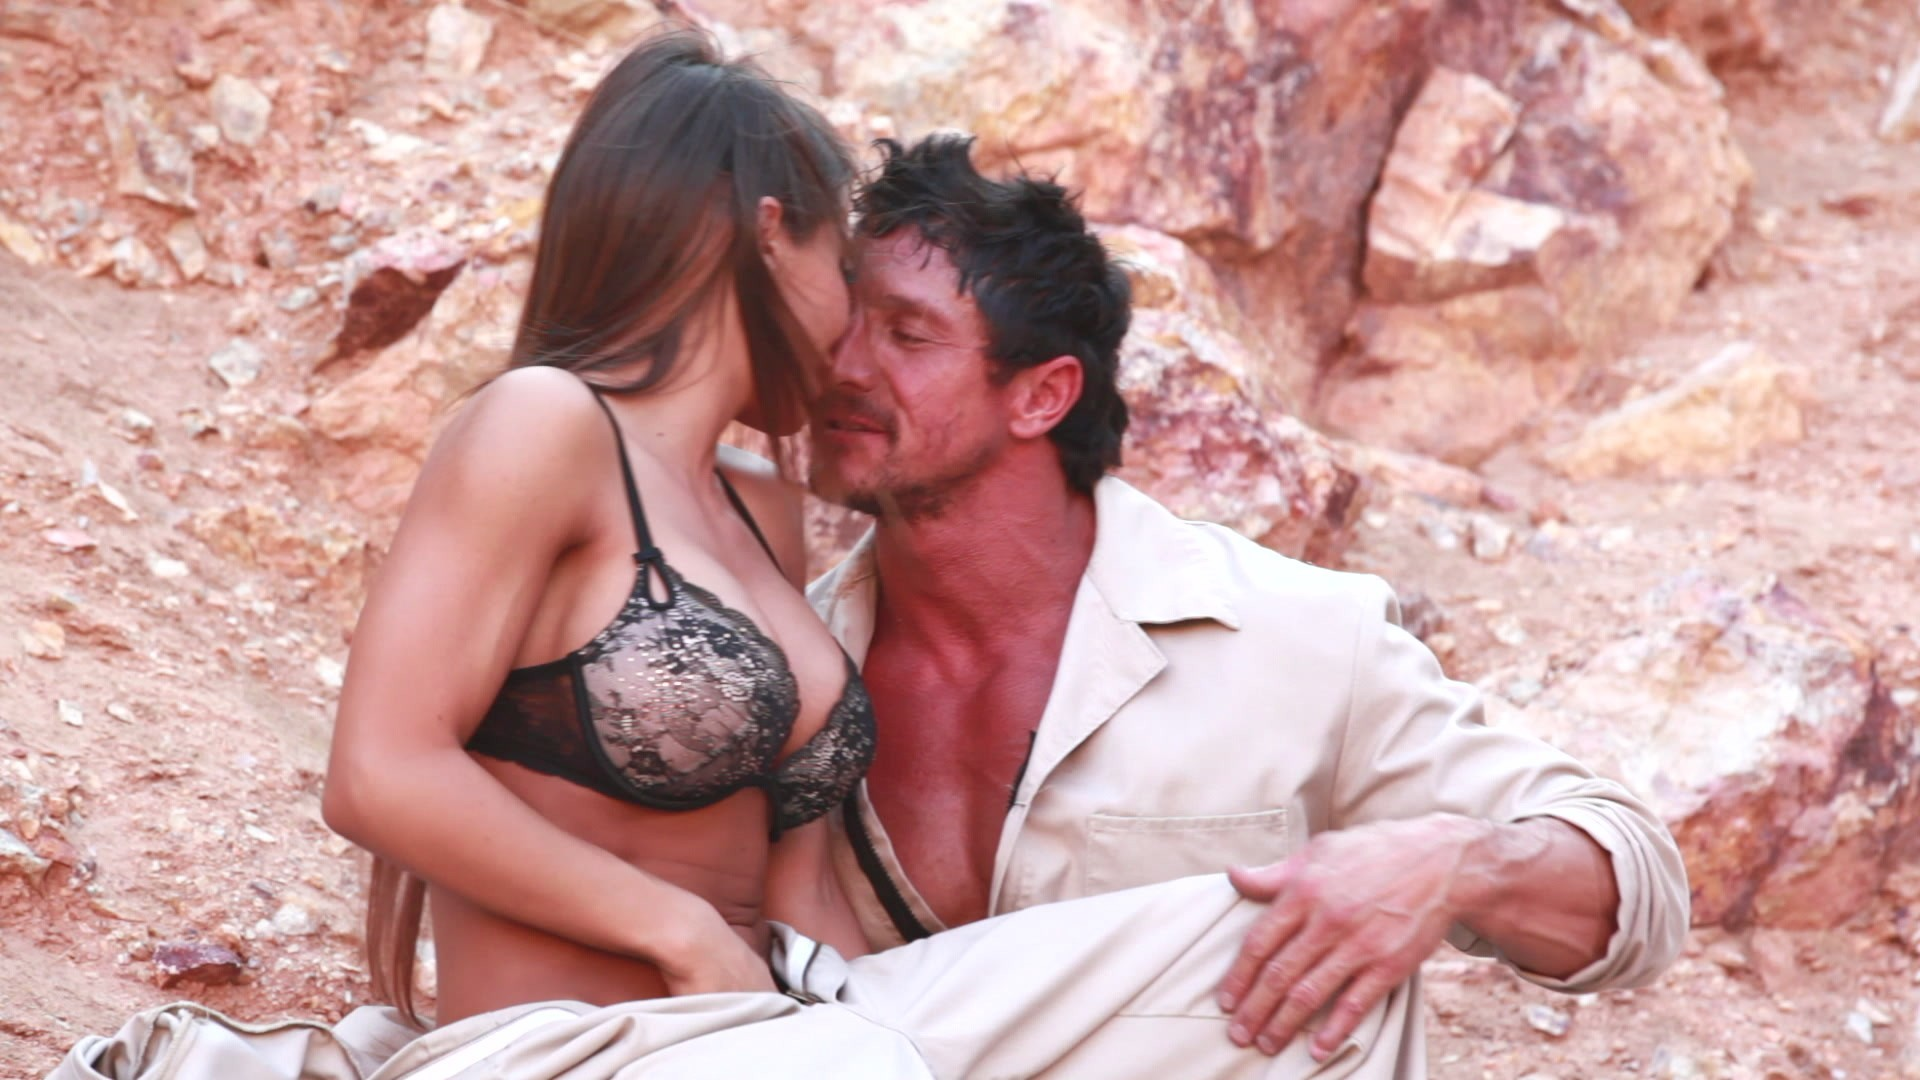 vidio erotico video eroti